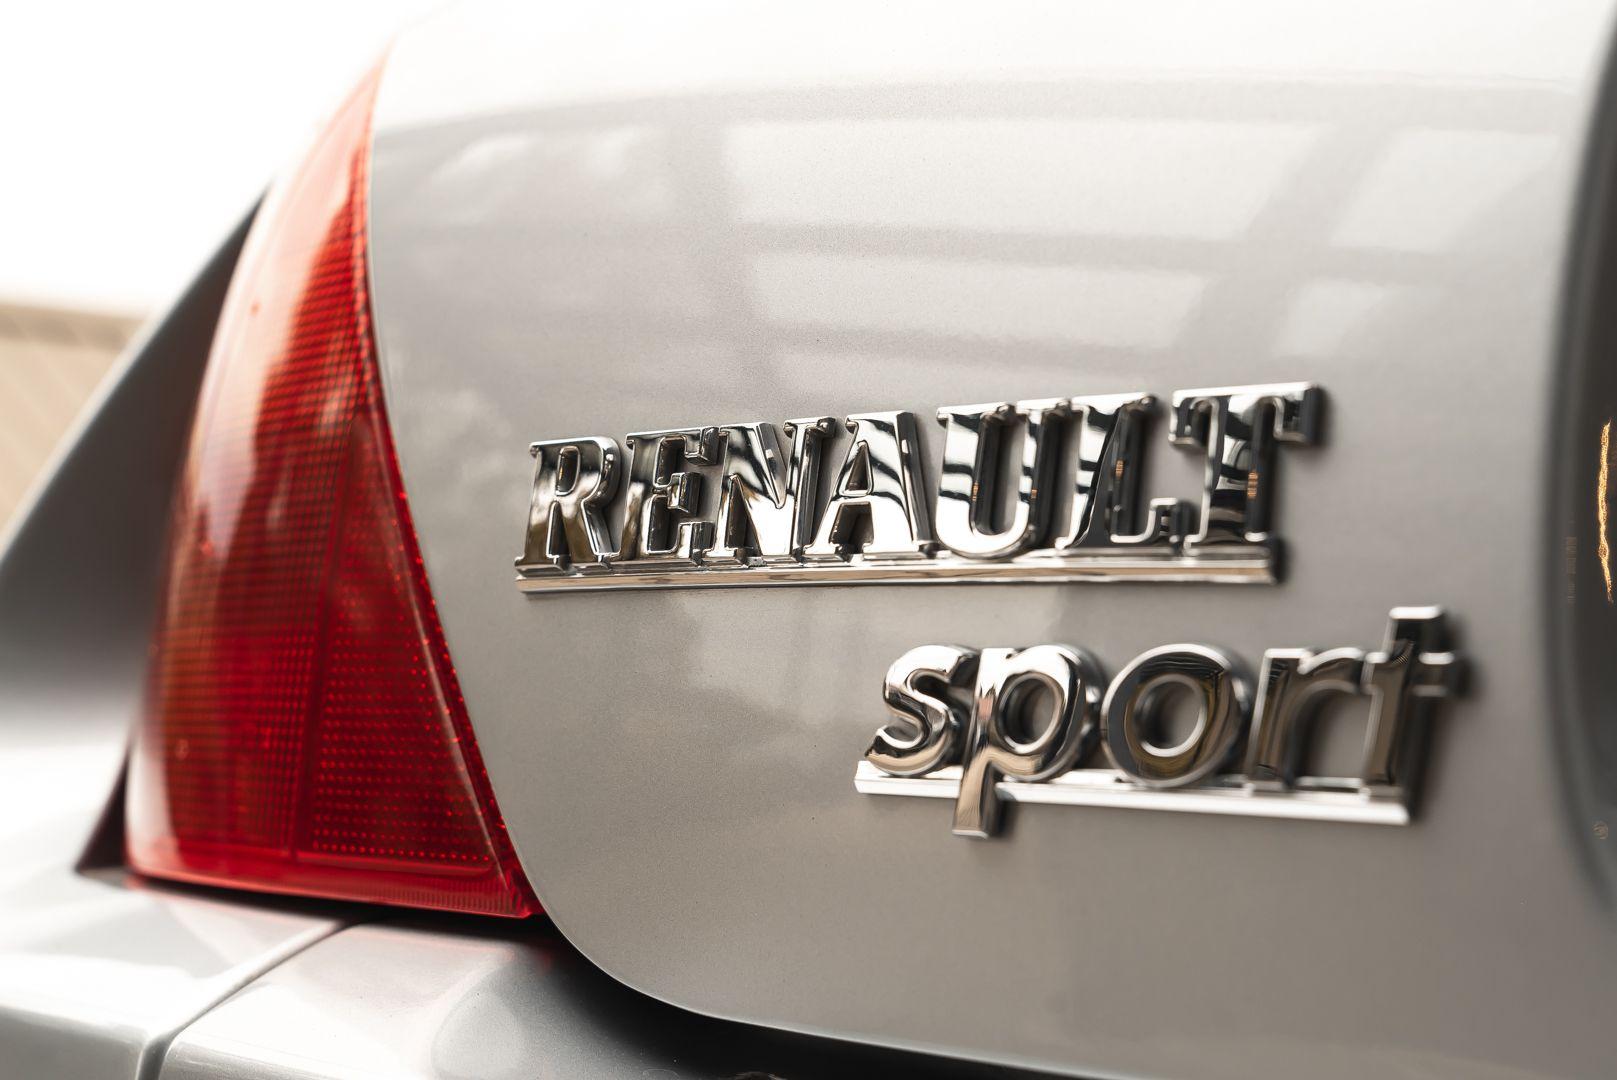 2002 Renault Clio 3.0 V6 Renault Sport Phase1 84937